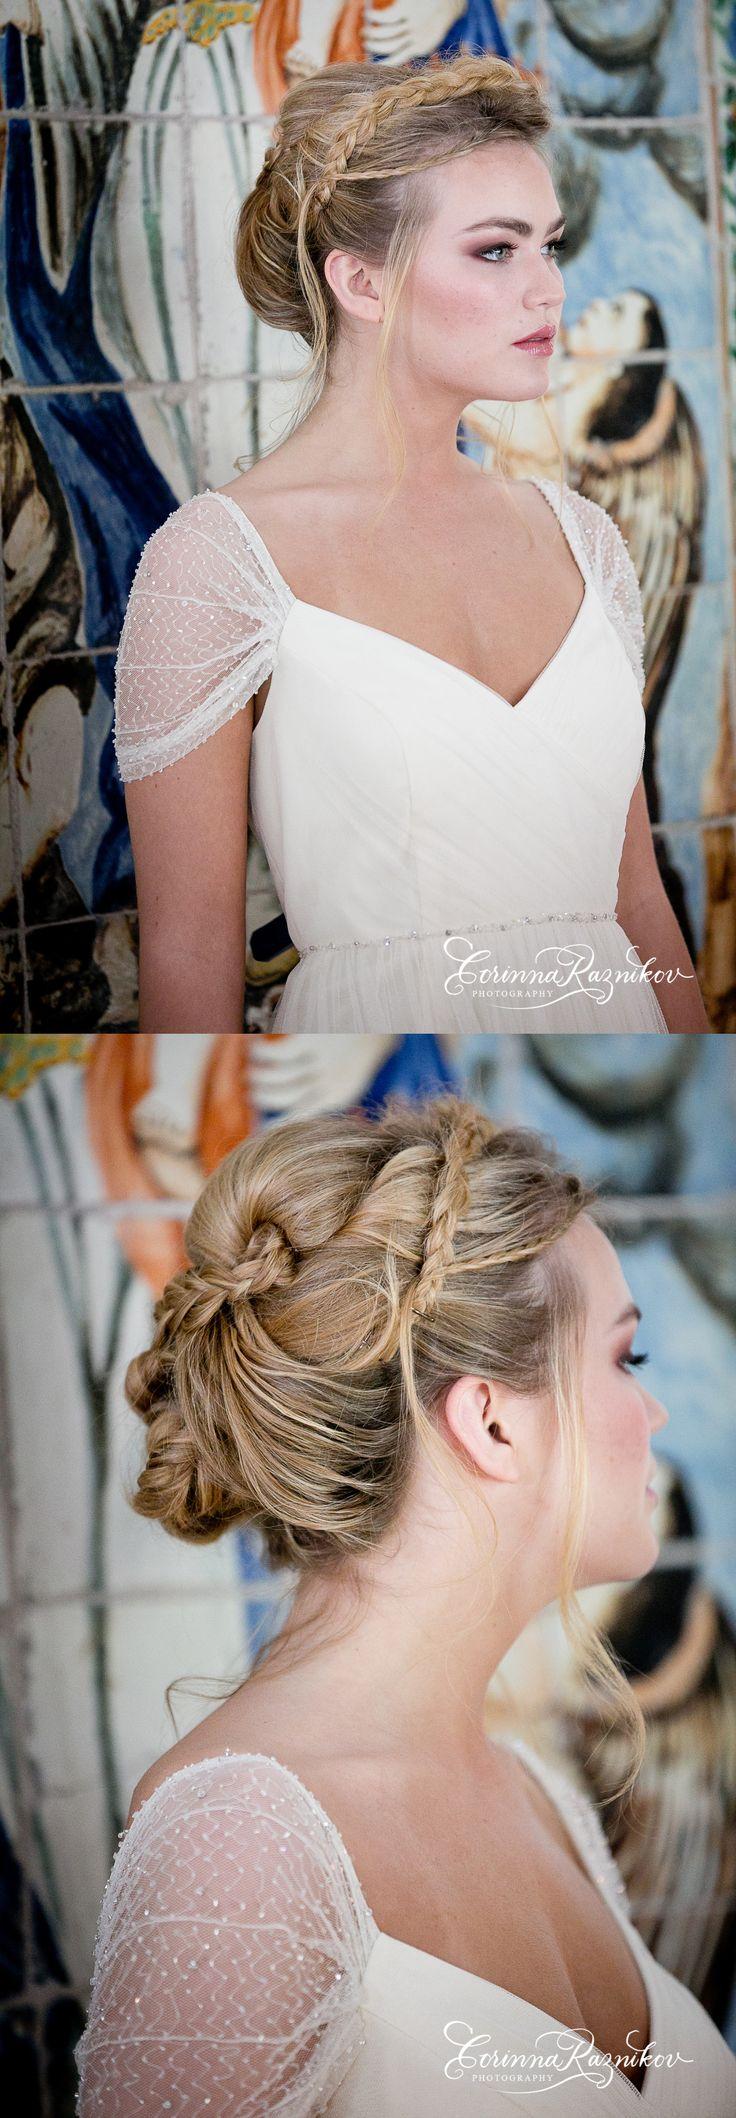 165 best wedding style images on pinterest | wedding styles, boston